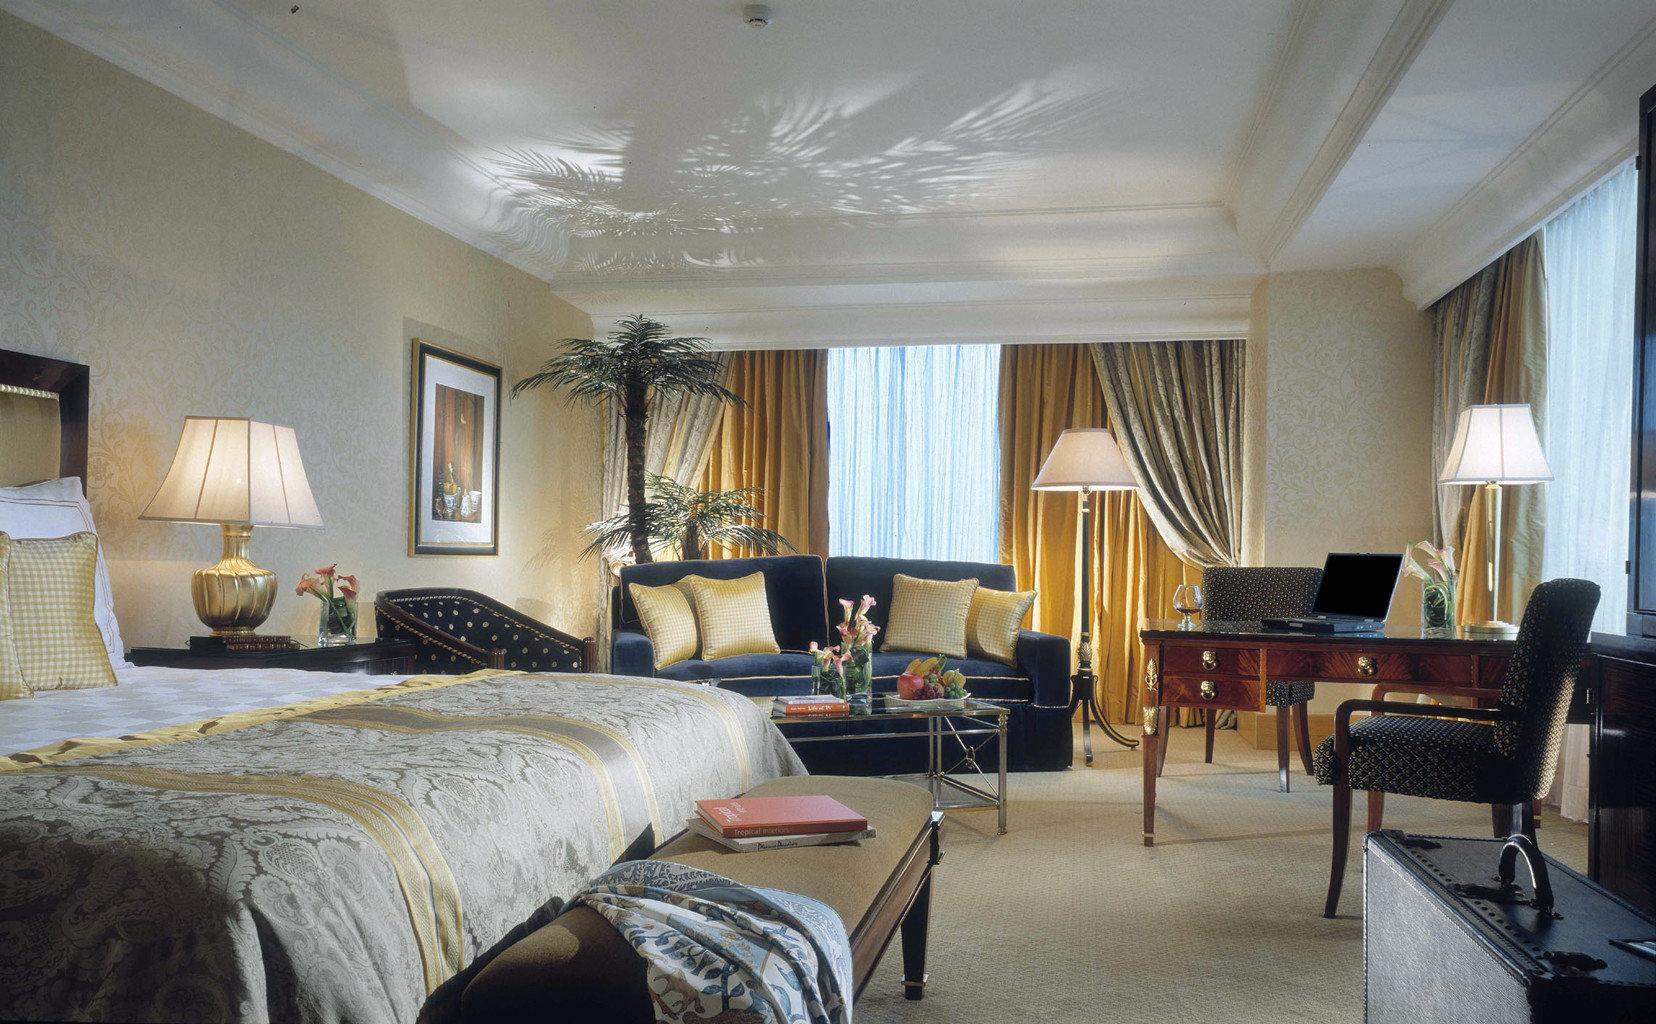 Bedroom Luxury Romance sofa property living room Suite home condominium Villa cottage Resort mansion containing